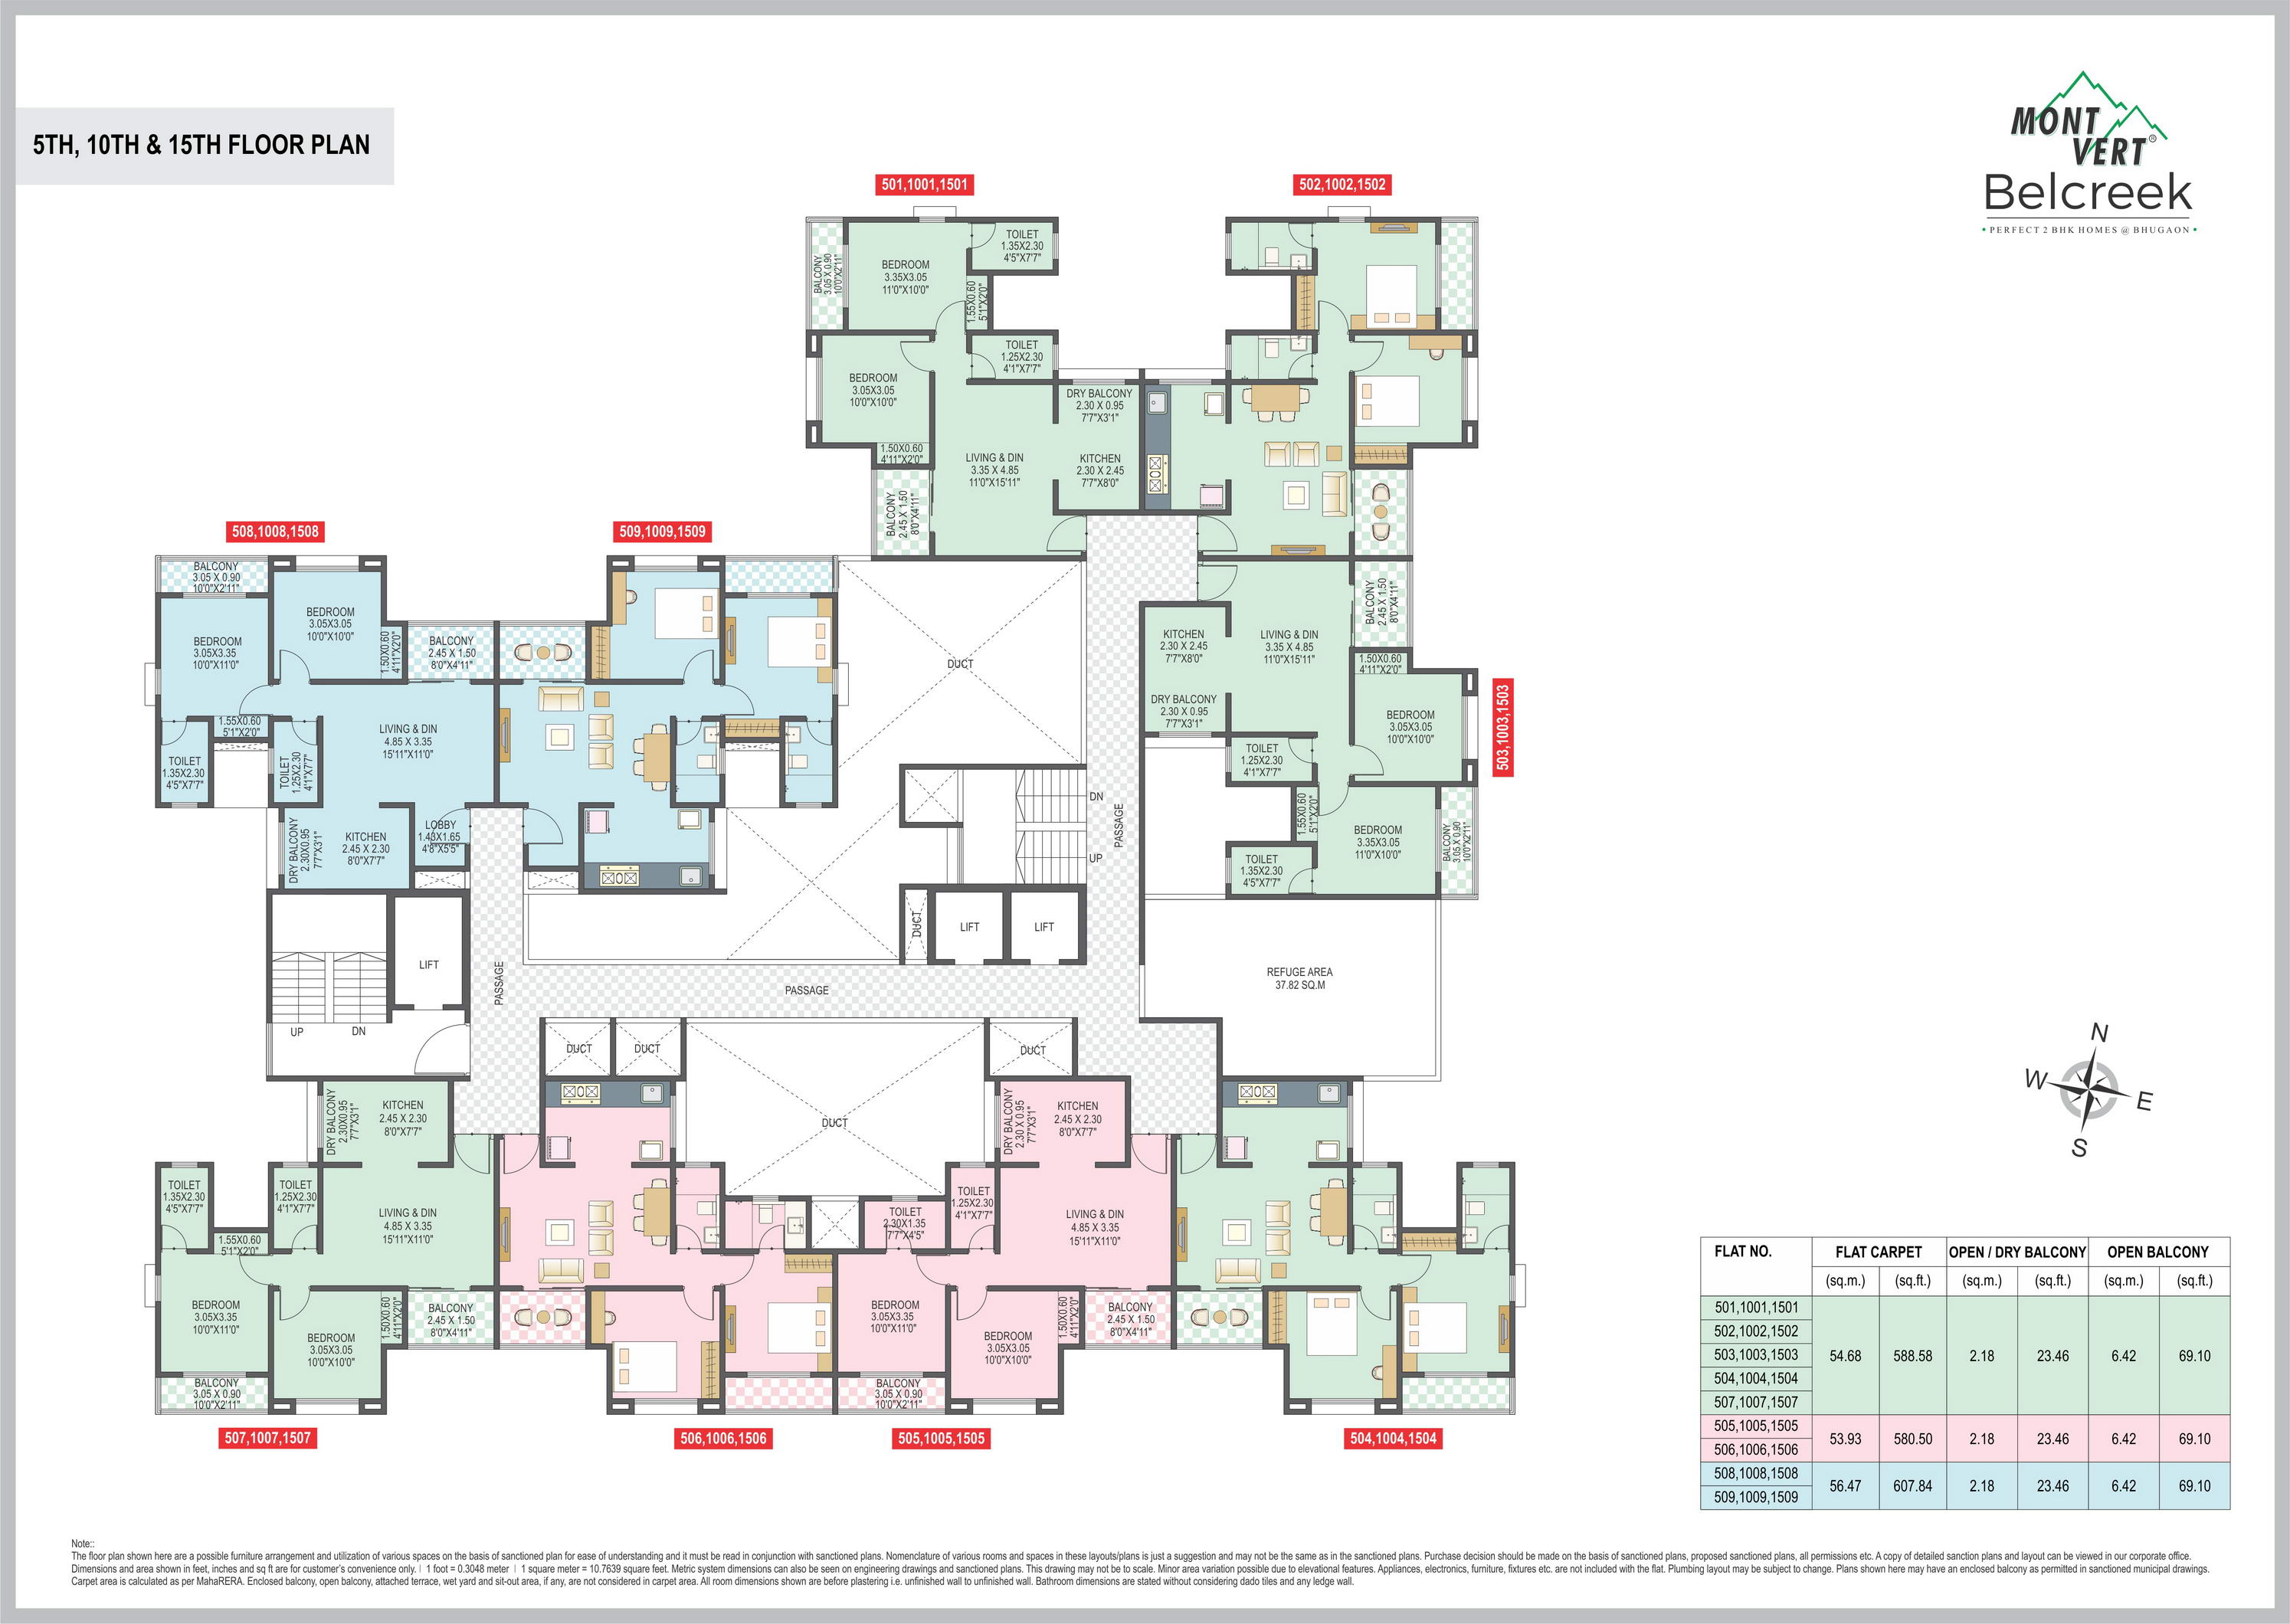 2-bhk-flats-for-sale-in-bavdhan-pune-mont-vert-belcreek-fire